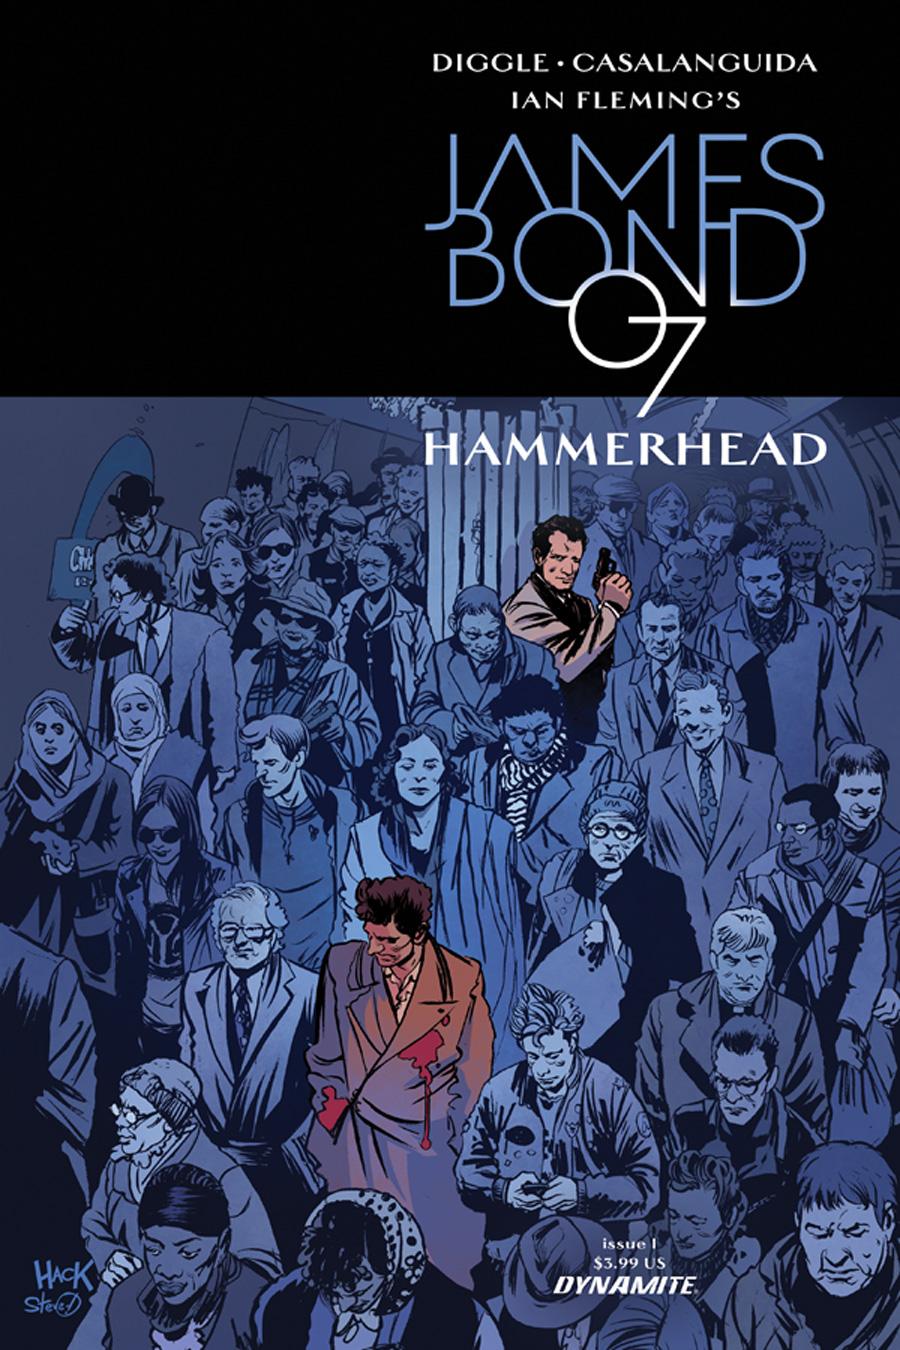 JamesBond-Hammerhead-001-B-Hack